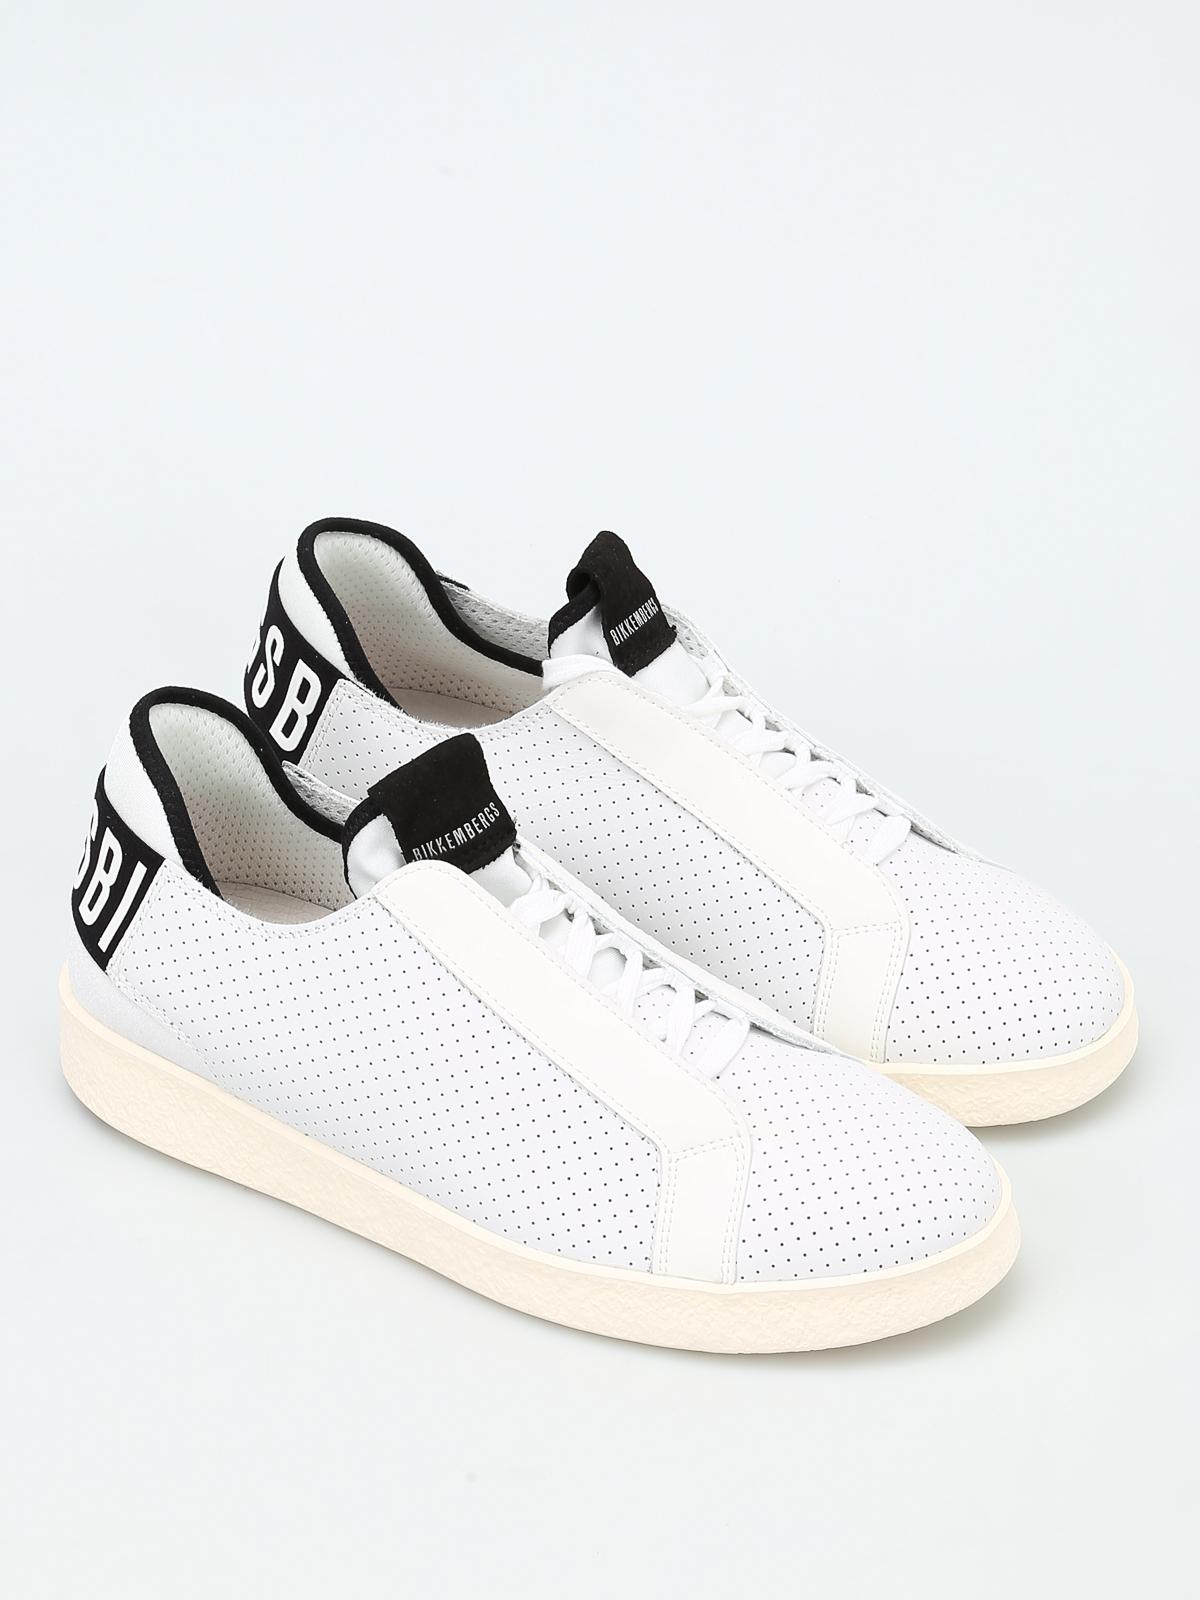 reputable site 155bb becda Bikkembergs - Best 872 sneakers - trainers - BKE108744 ...